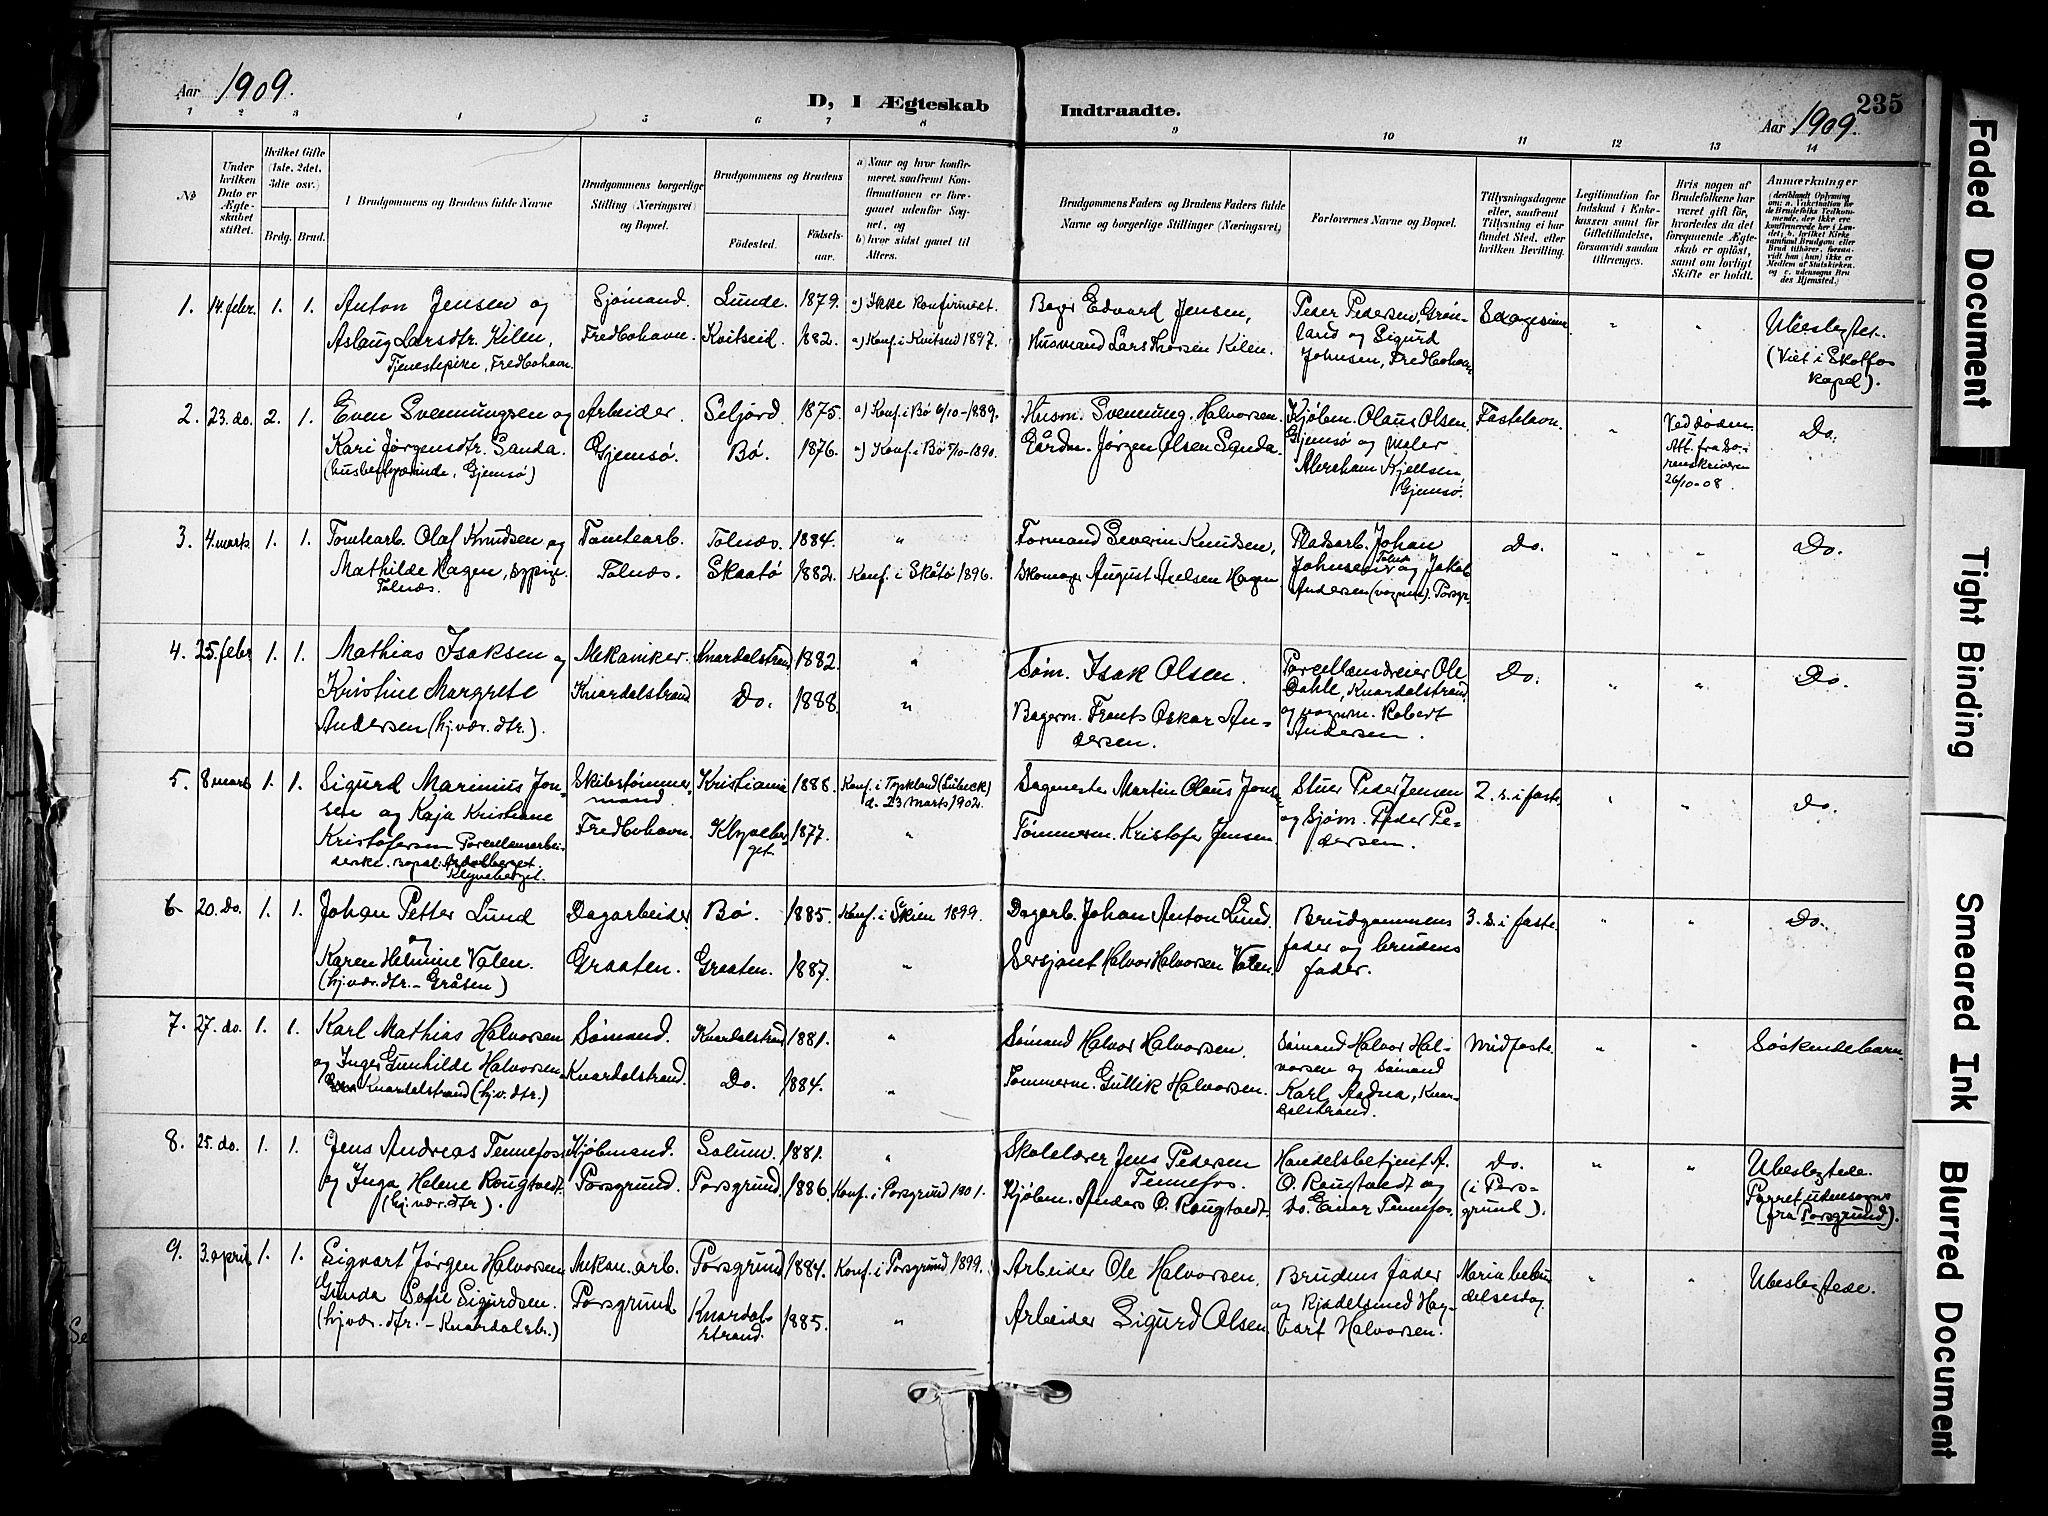 SAKO, Solum kirkebøker, F/Fa/L0011: Ministerialbok nr. I 11, 1898-1909, s. 235